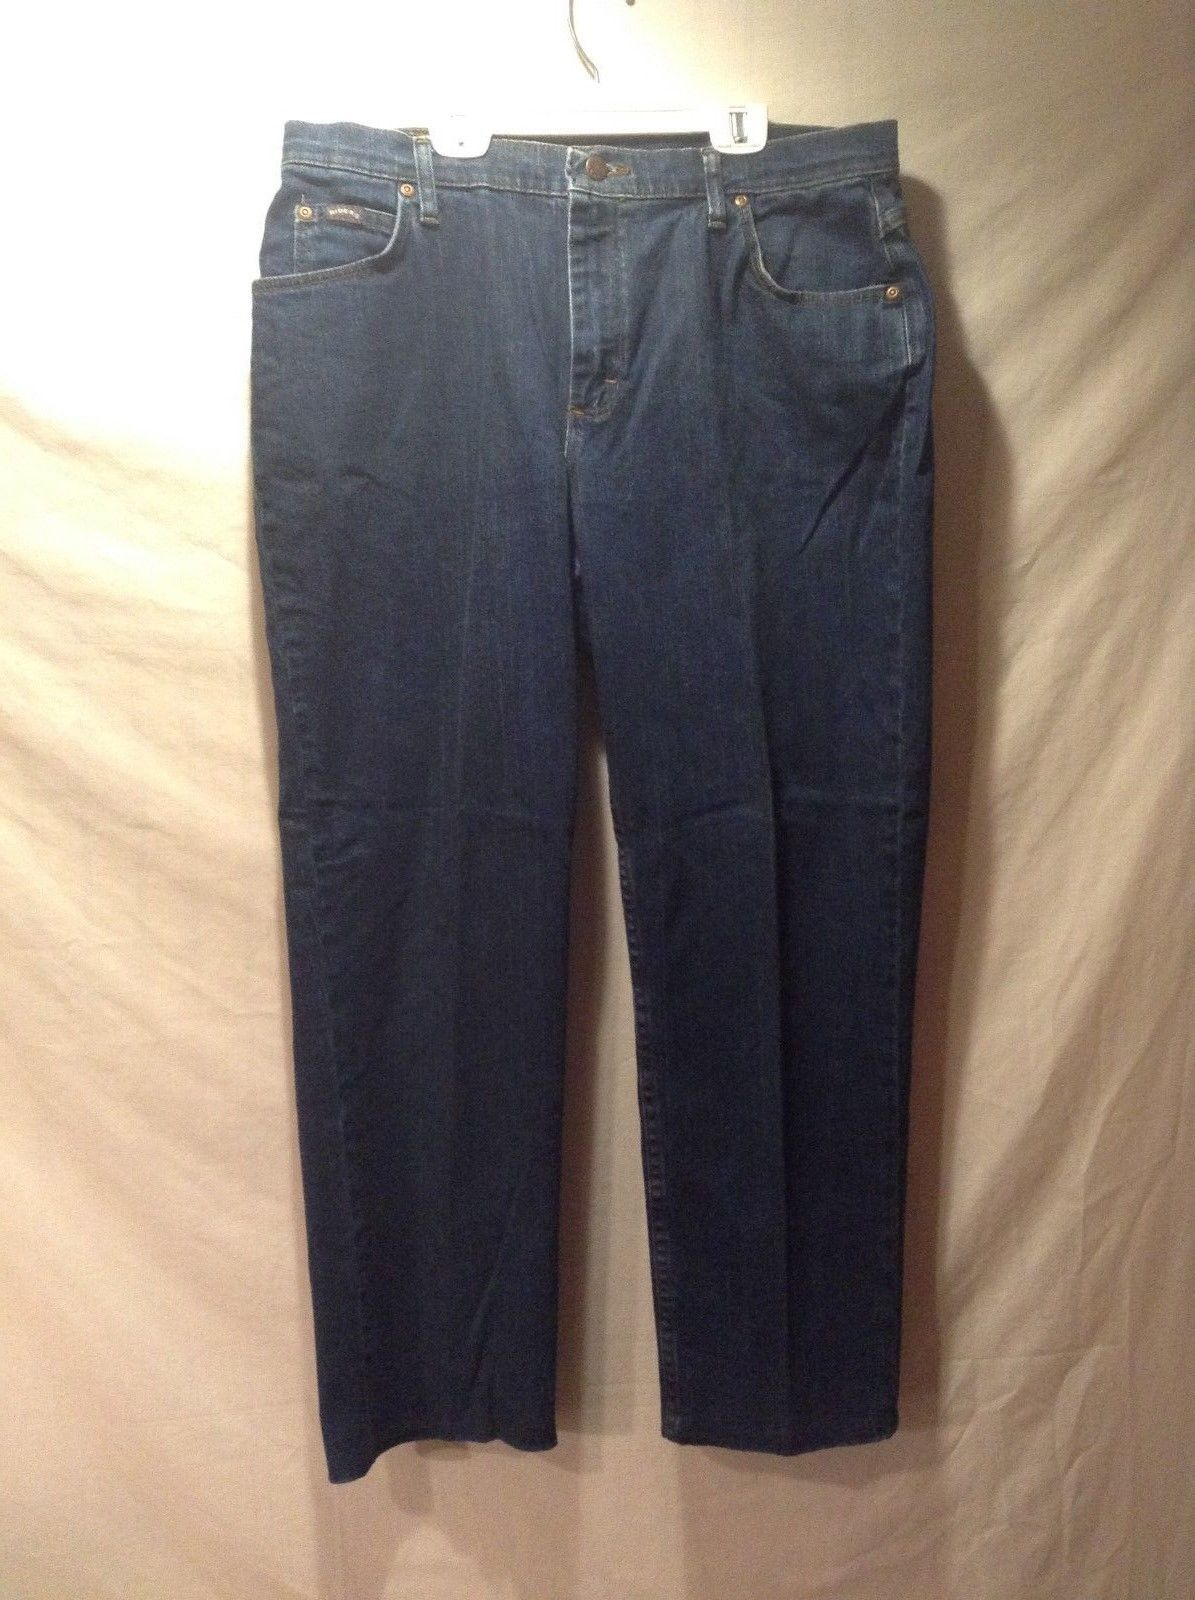 Women's Riders Denim Blue Jeans